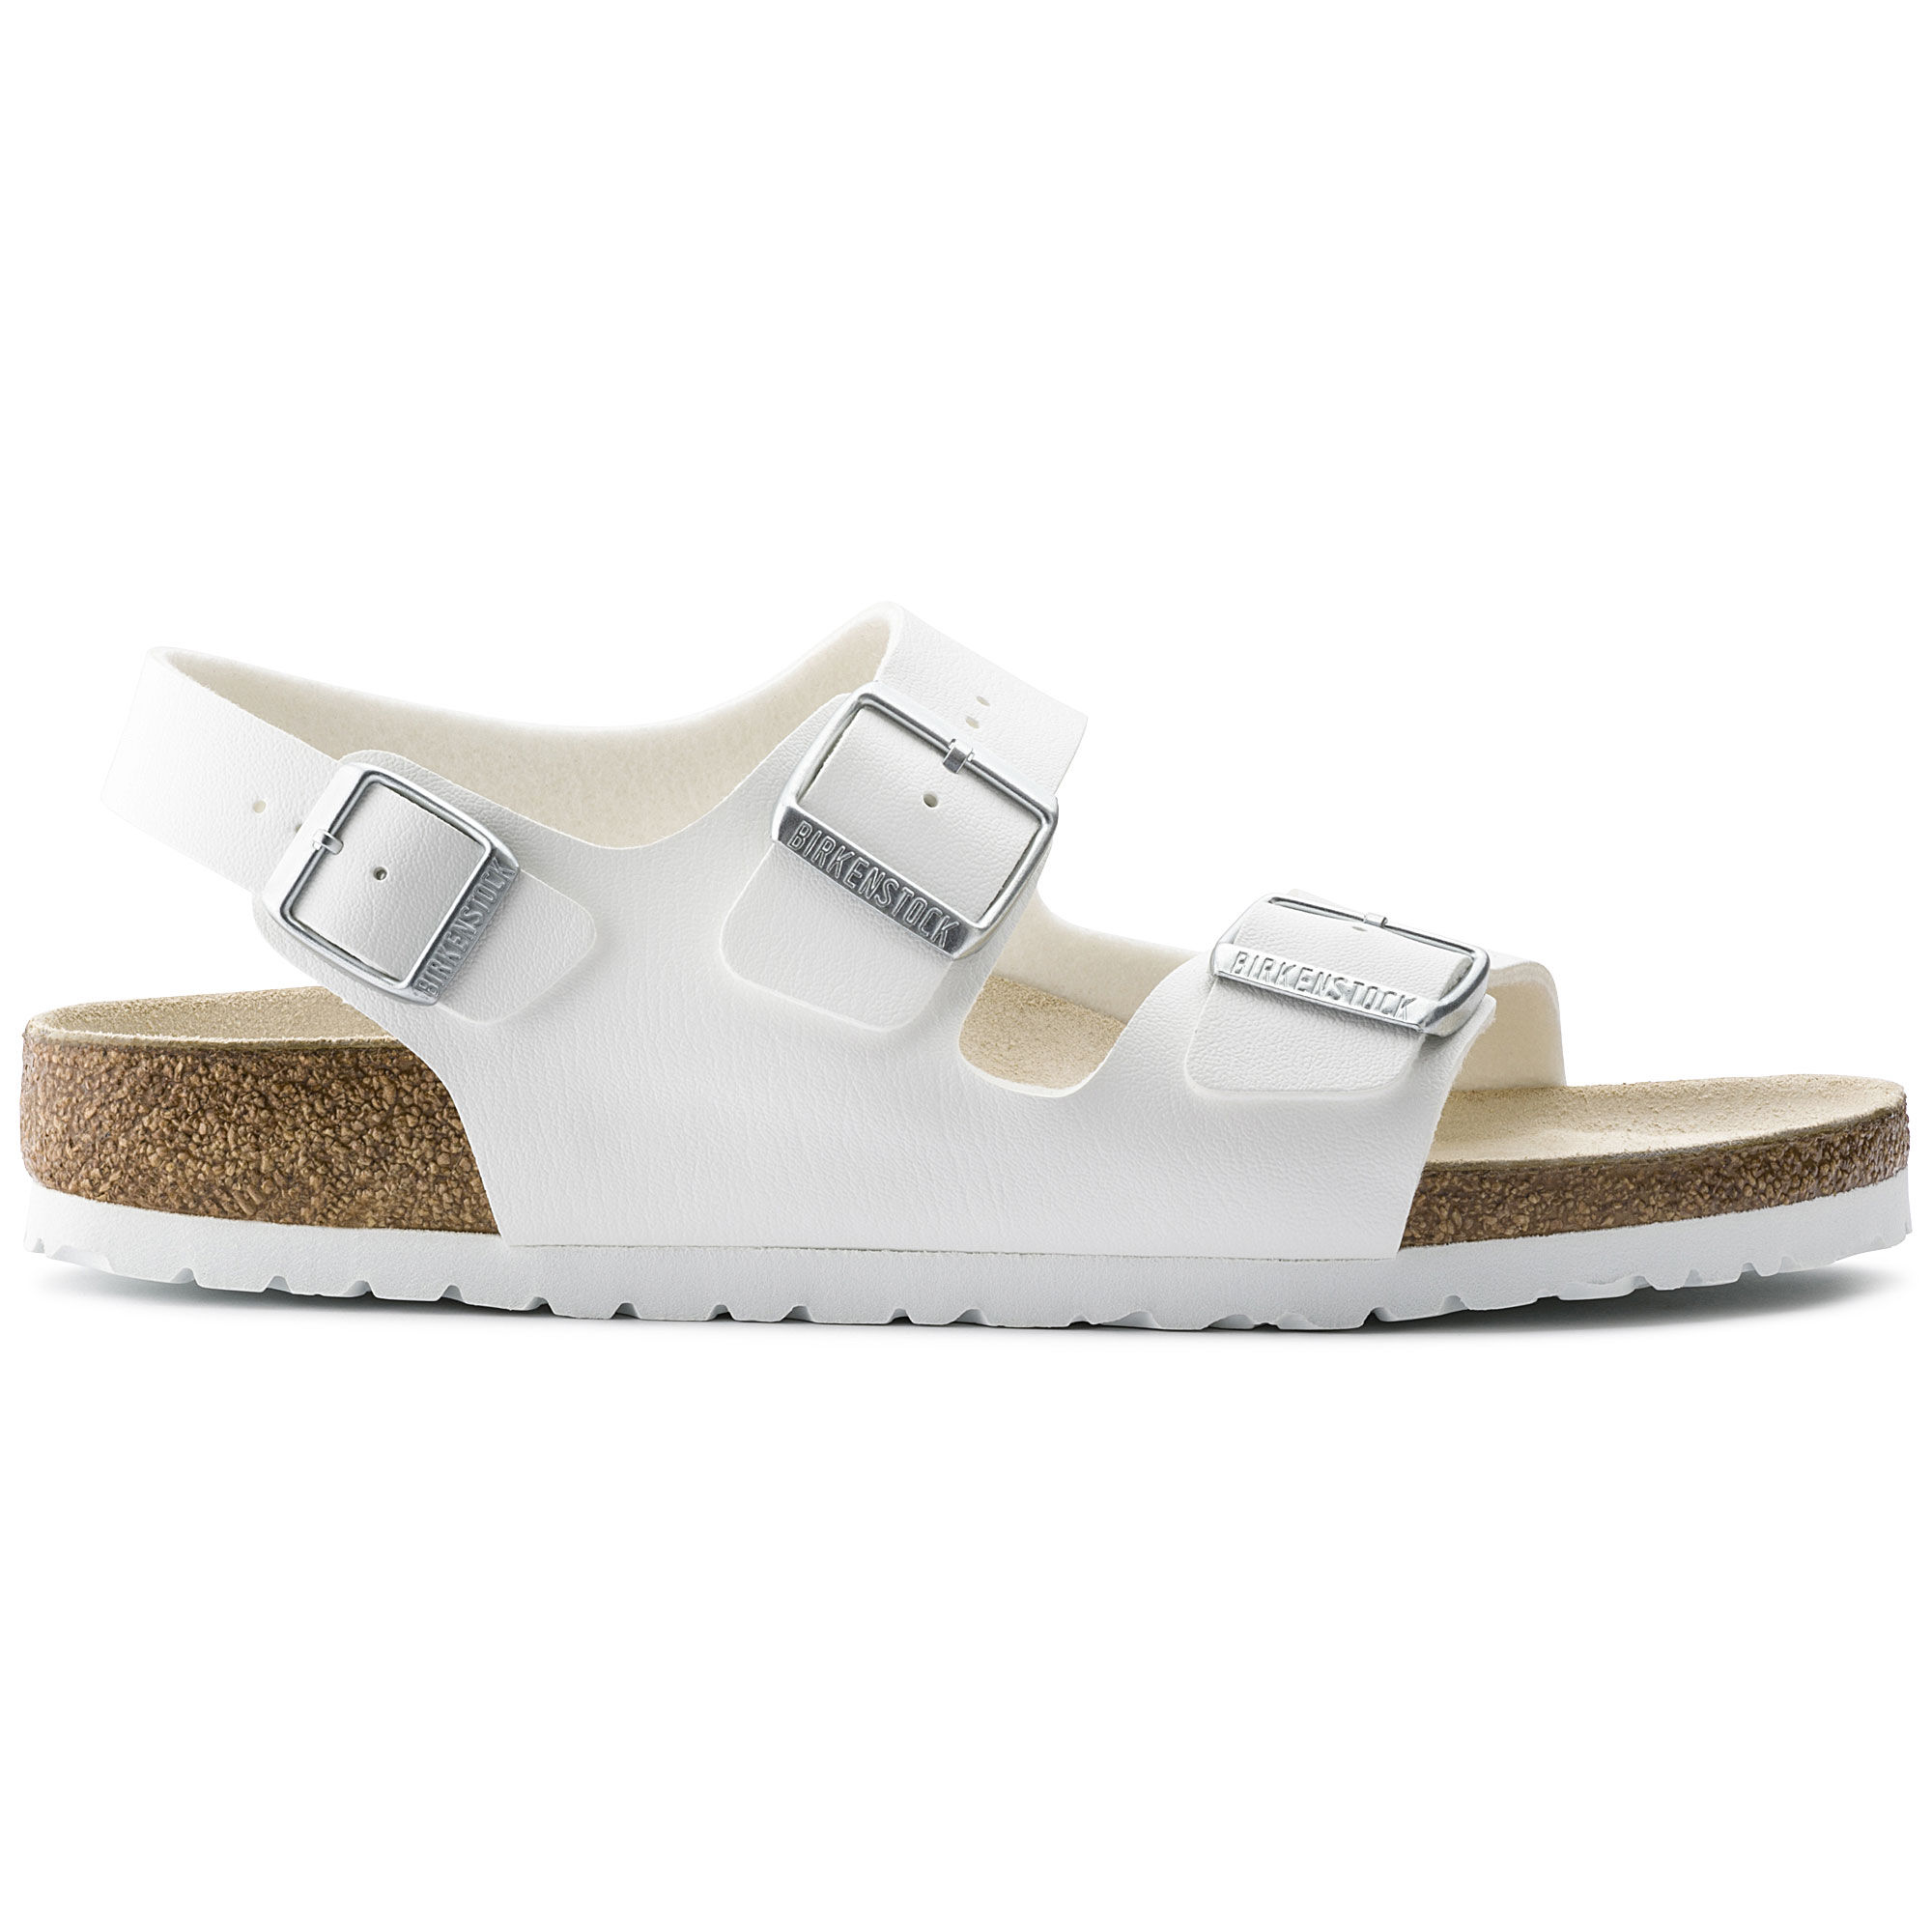 Buy Women Shoes / Birken1 Stock2 Milano Birko Flor White Slider Flat Sandals